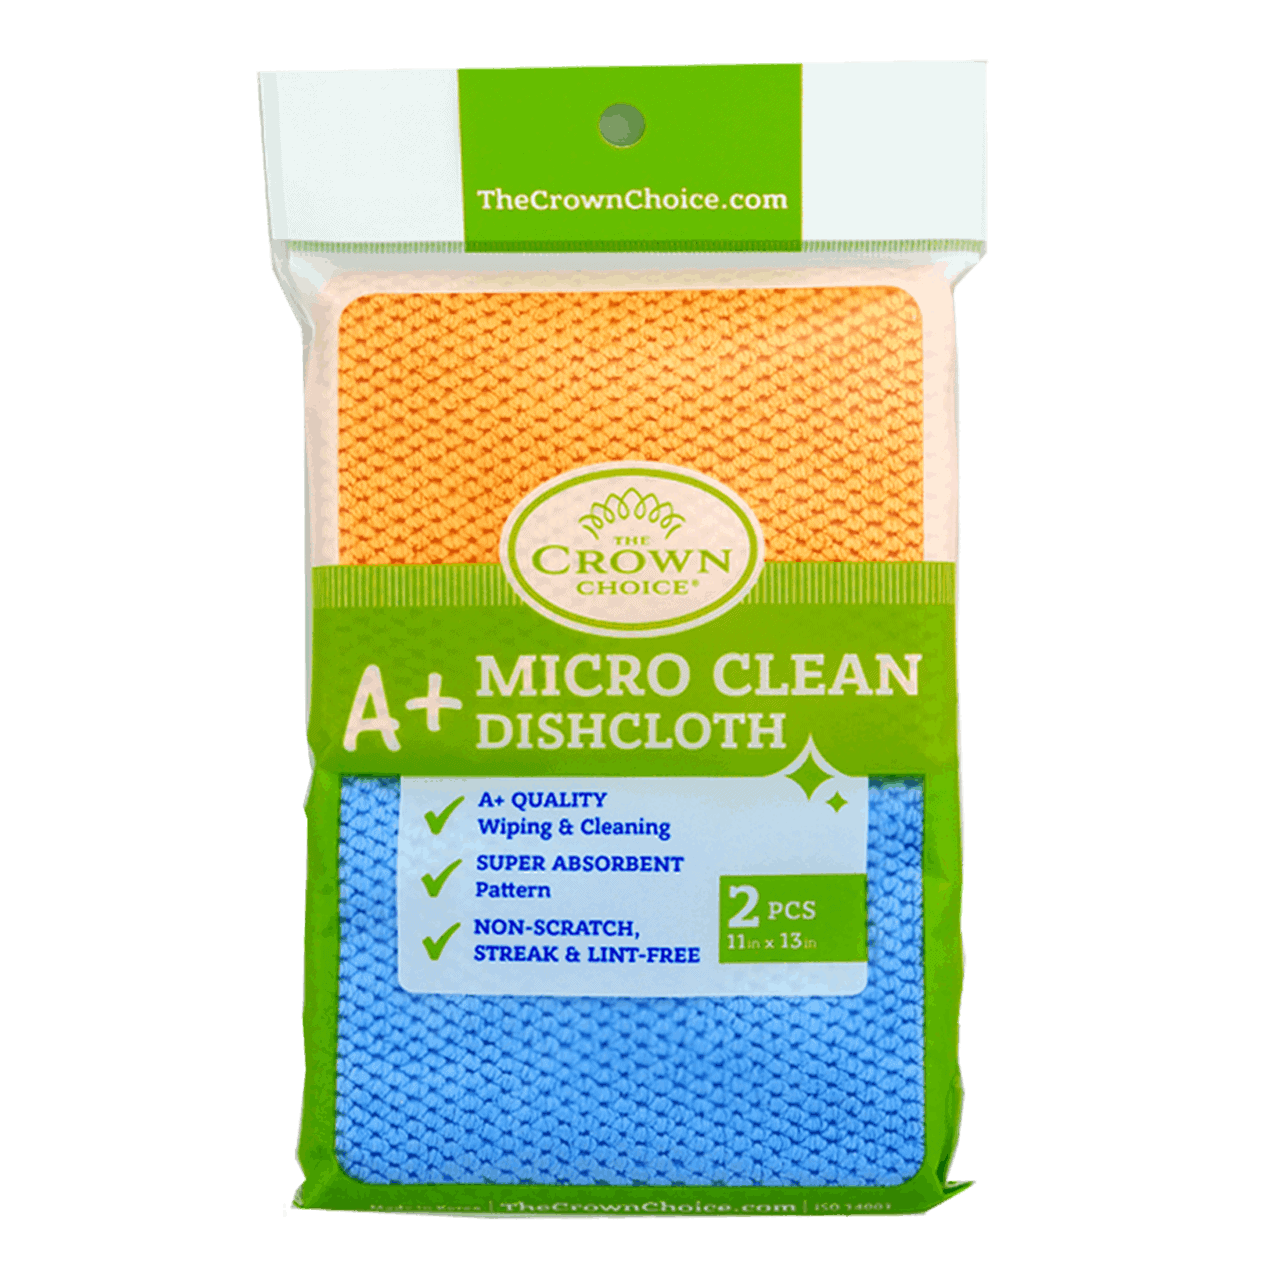 Pot Scrubber A+ Micro Fiber Dish Cloth